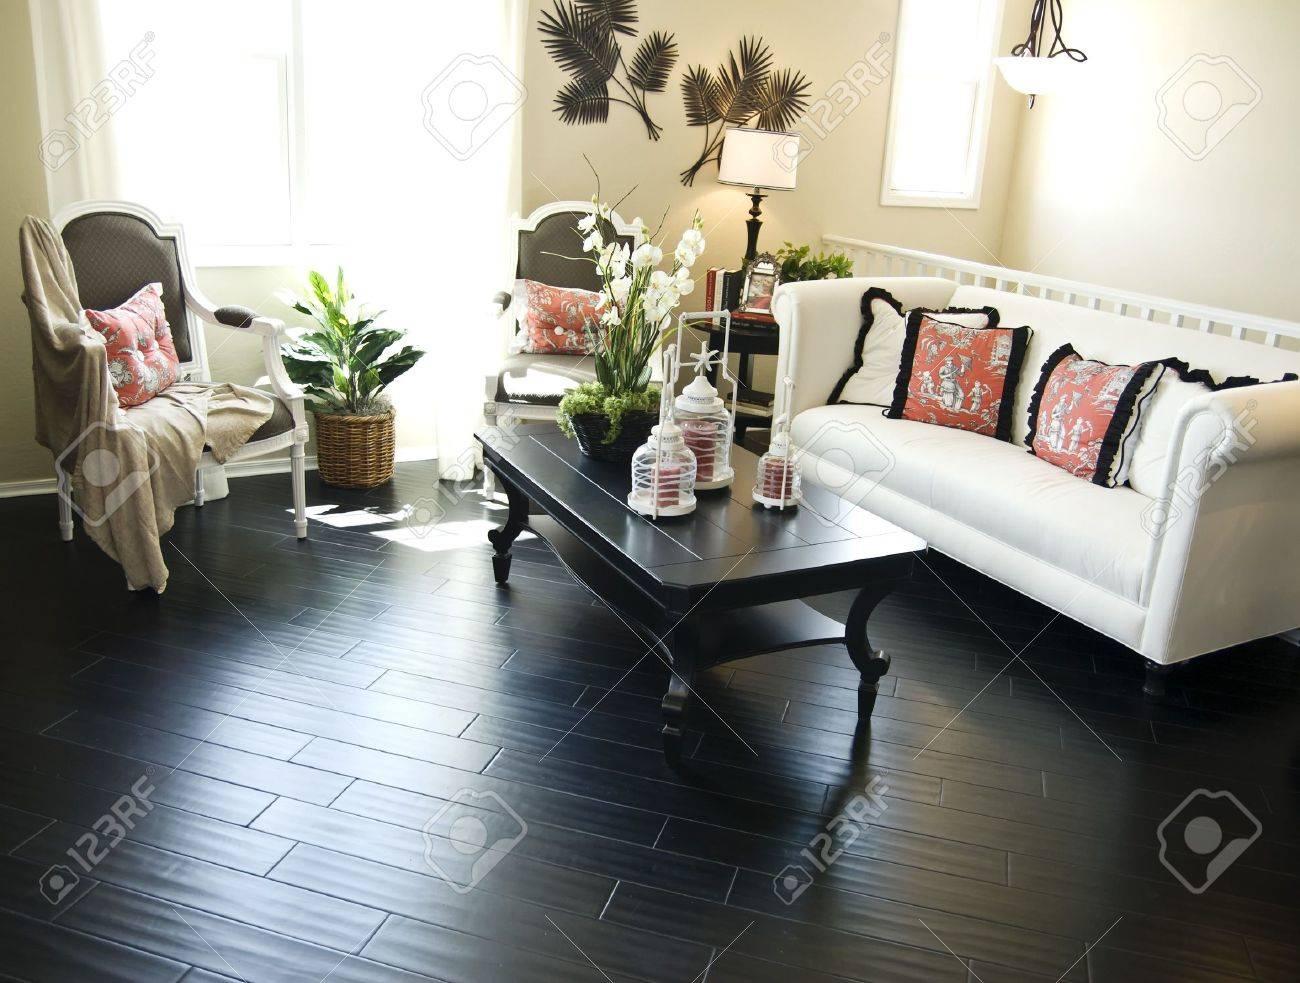 Bright modern interior Design with hard wood flooring Stock Photo - 2802576